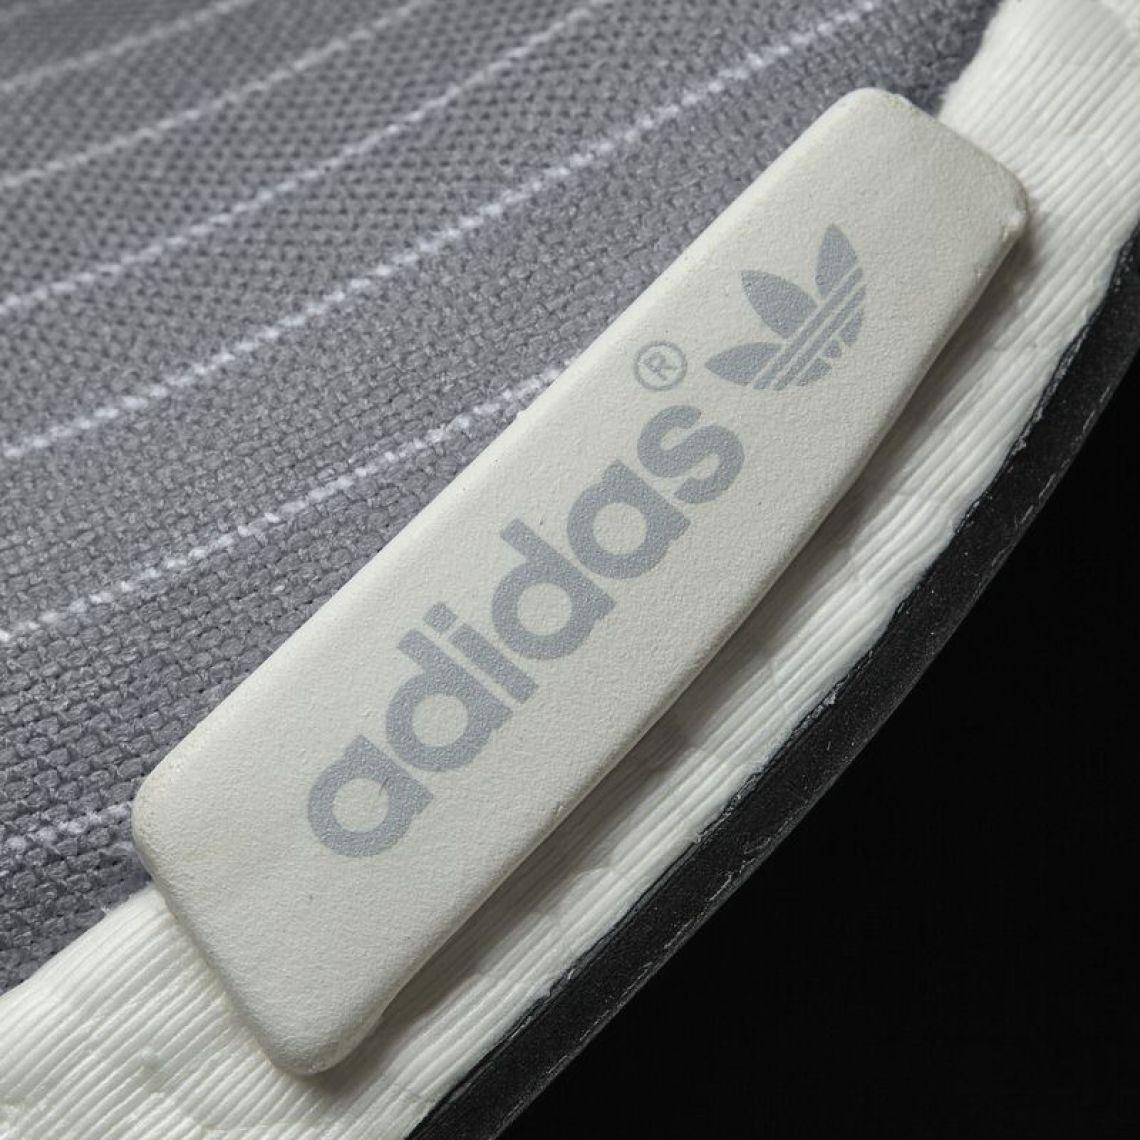 dfa5ec059 adidas NMD R1 White Grey CQ2411 Release Date